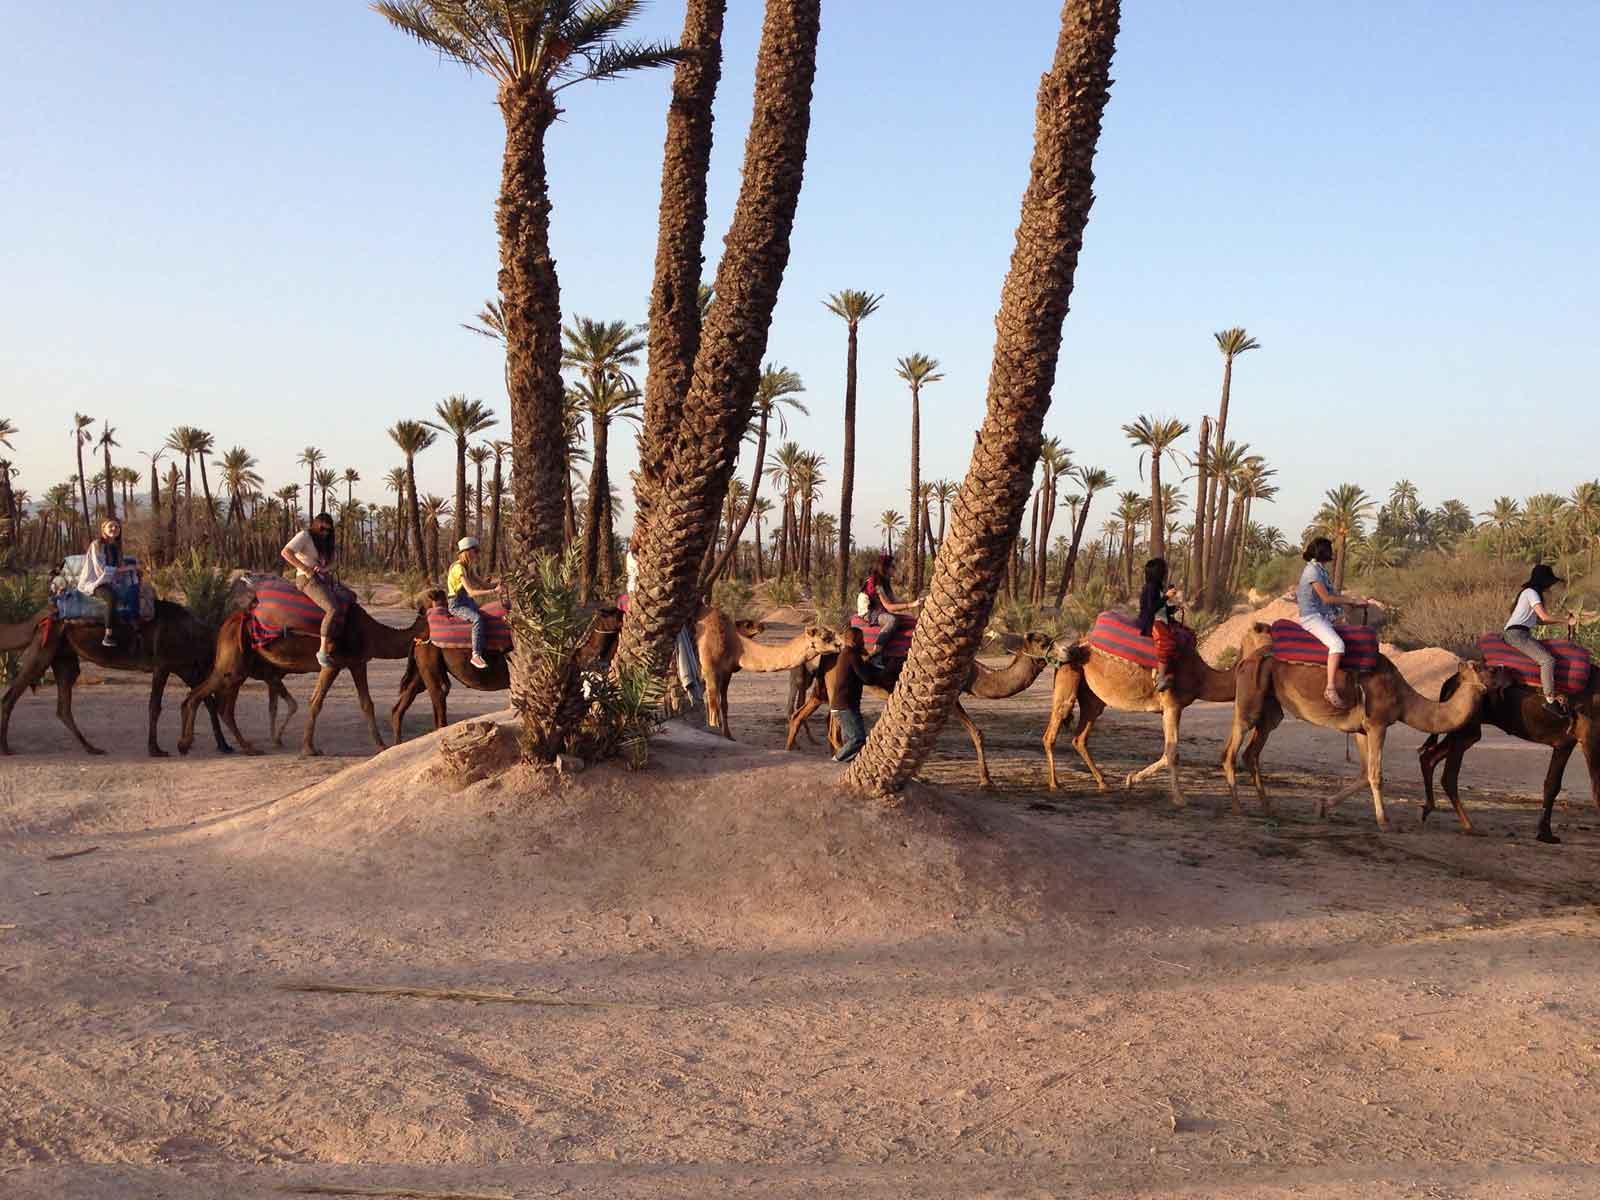 excursion marrakech camel trek day trip